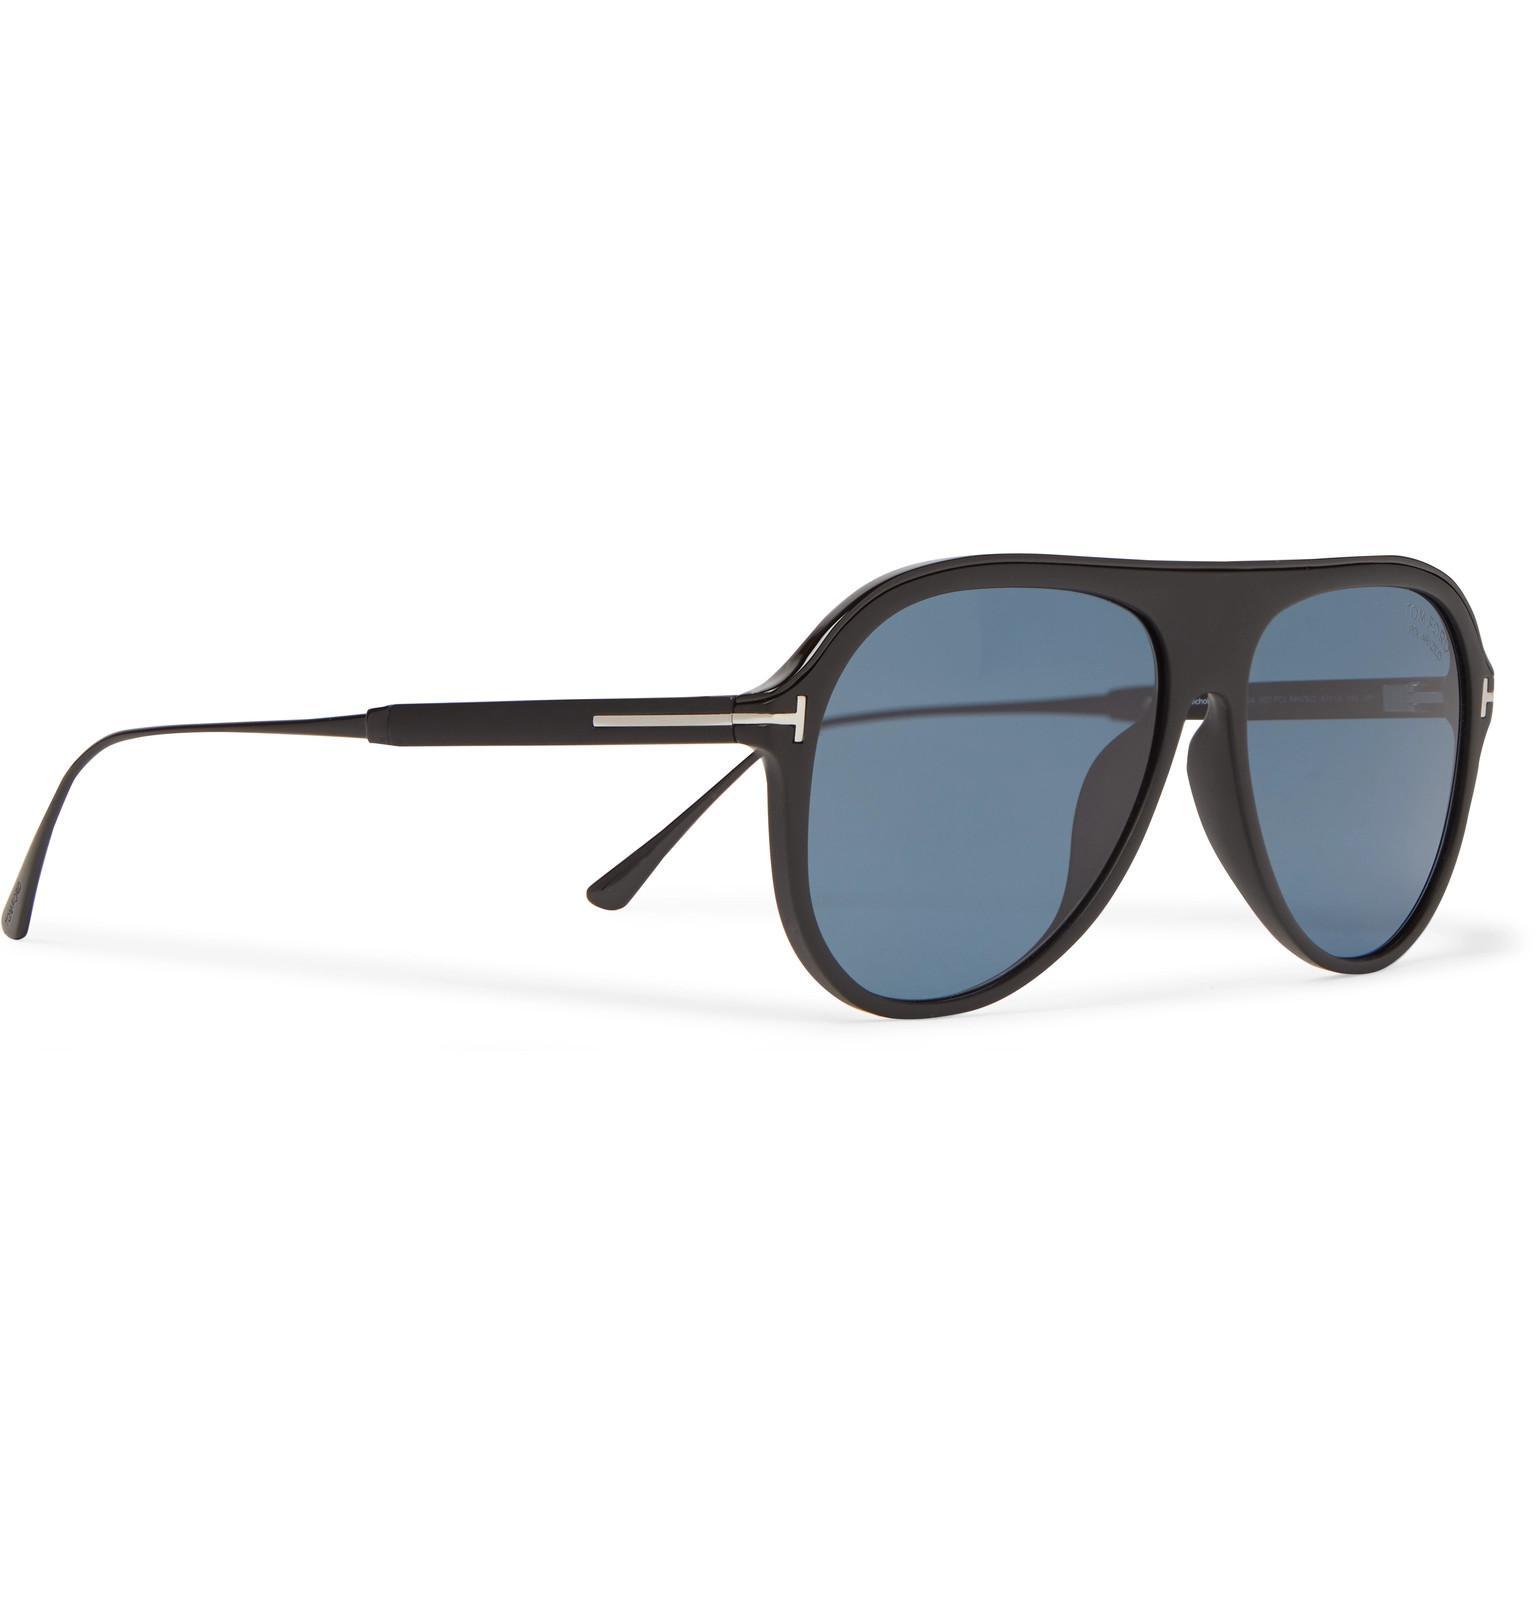 8b8e4eeb34a Tom Ford - Black Nicholai Aviator-style Acetate Polarised Sunglasses for Men  - Lyst. View fullscreen